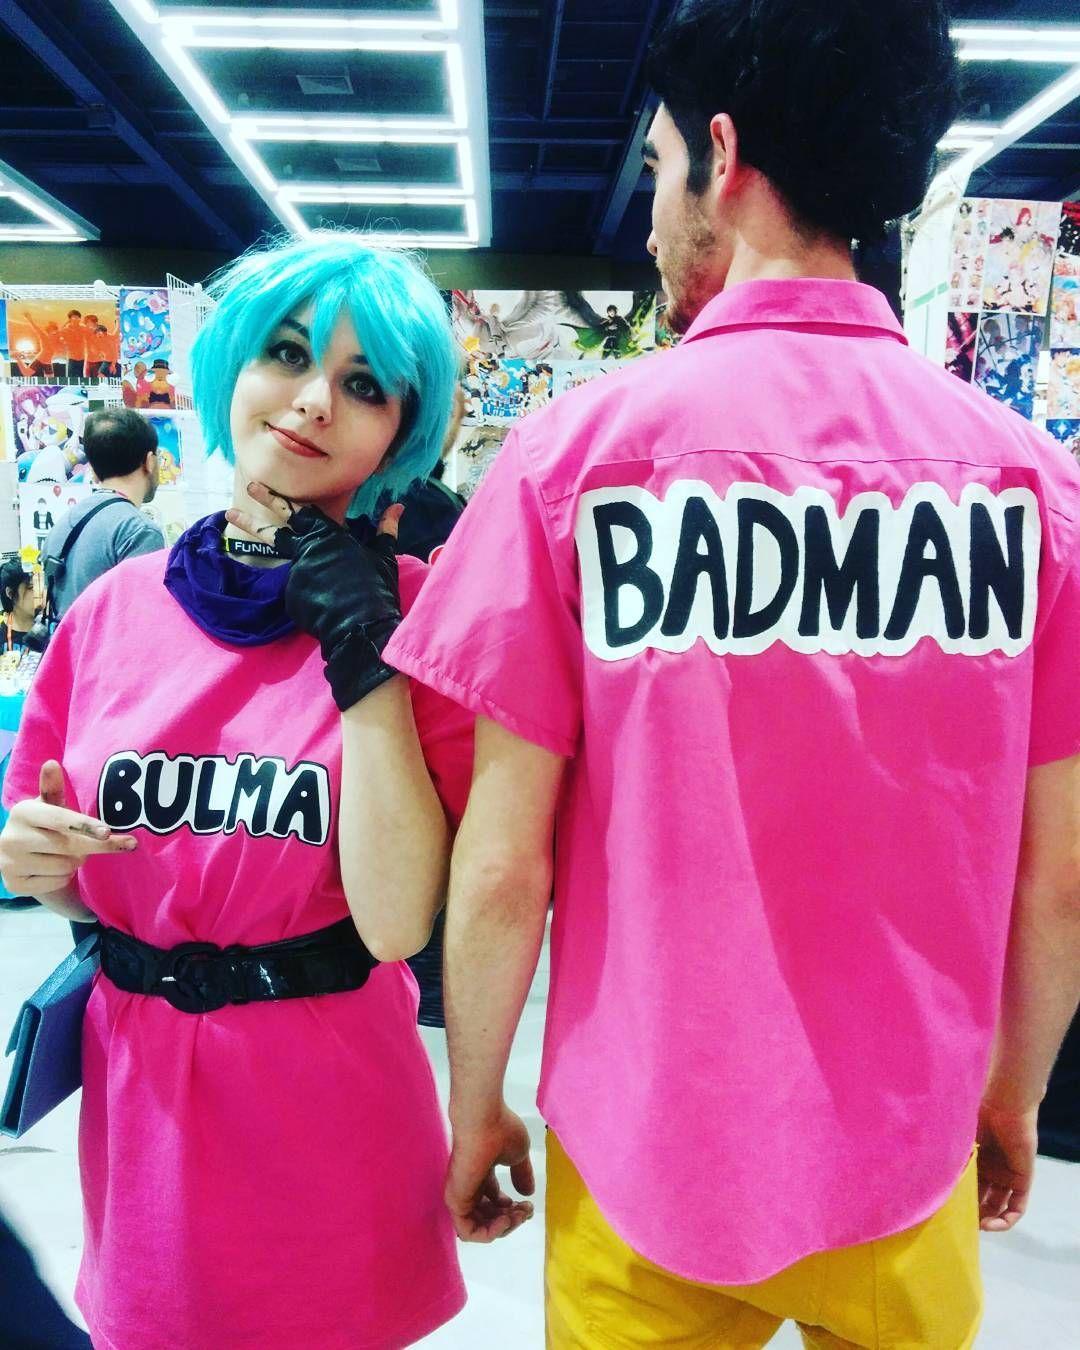 Bulma and her badman #bulma #vegeta #dragonball #dbz #cosplay ...